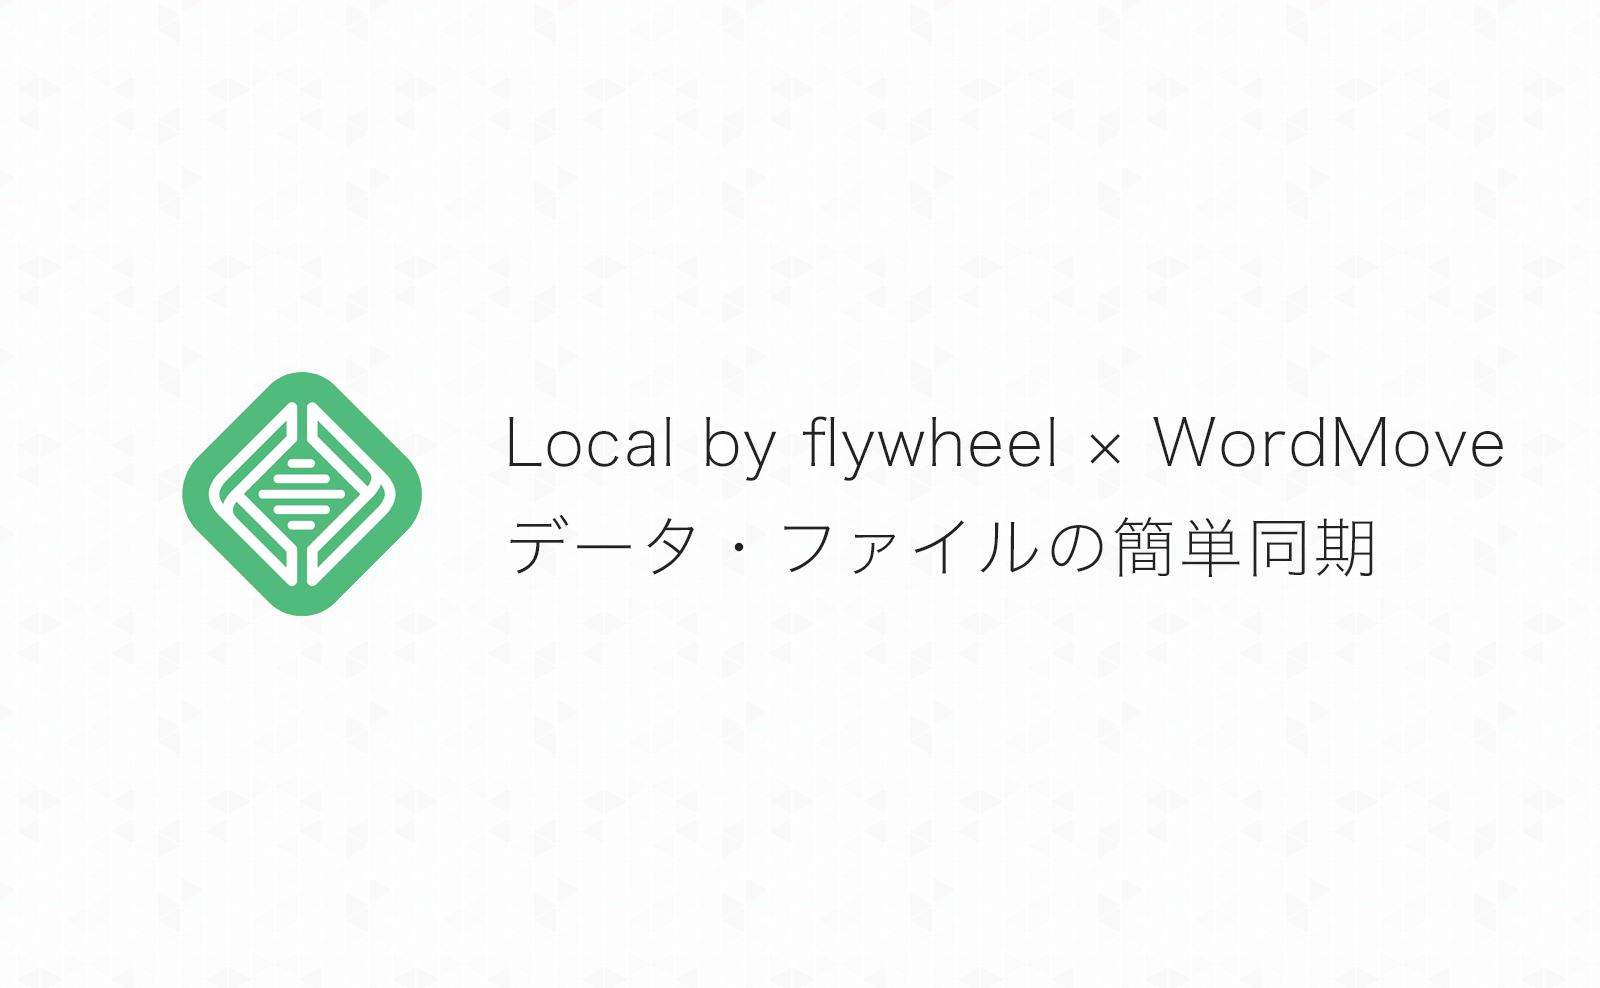 Local by Flywheelのサイトと本番サイトをWordMoveでデータ同期する環境準備メモ